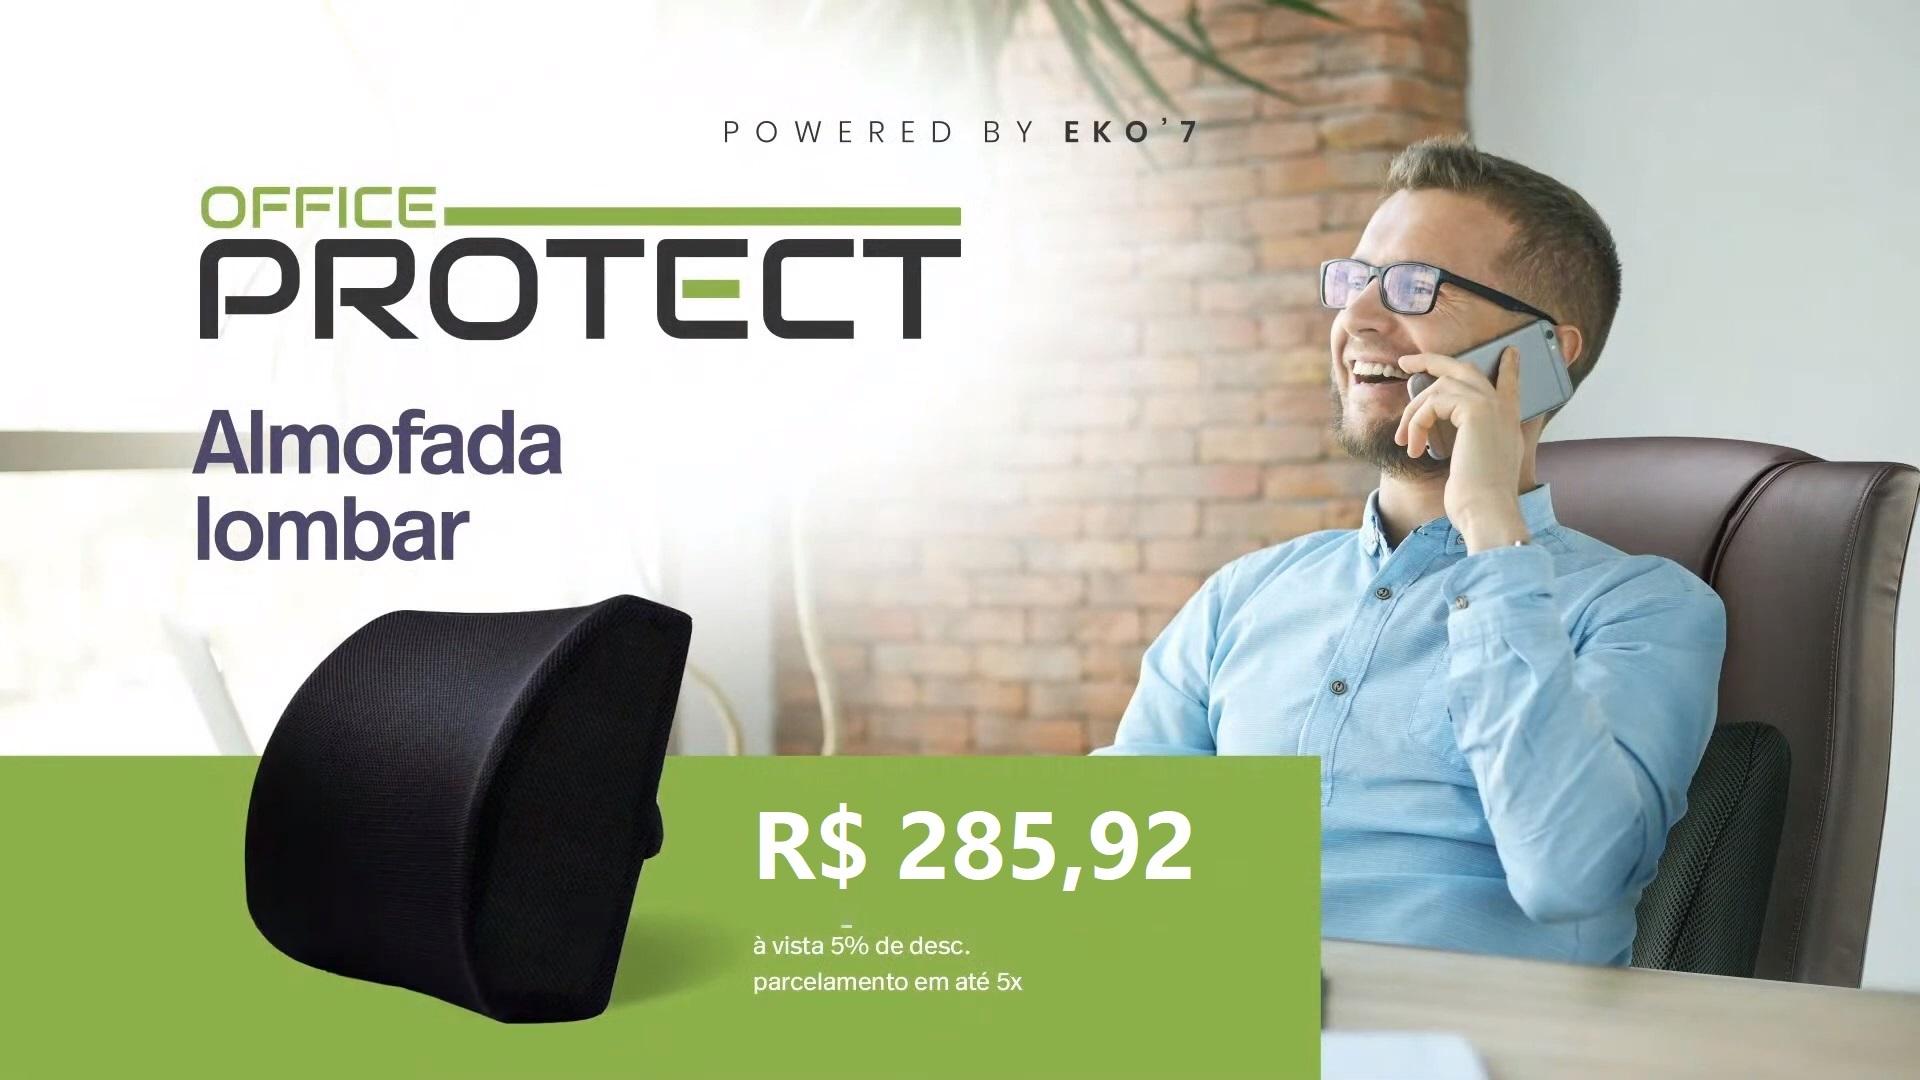 Almofada Lombar Office Protect Eko7 Saga Brasil